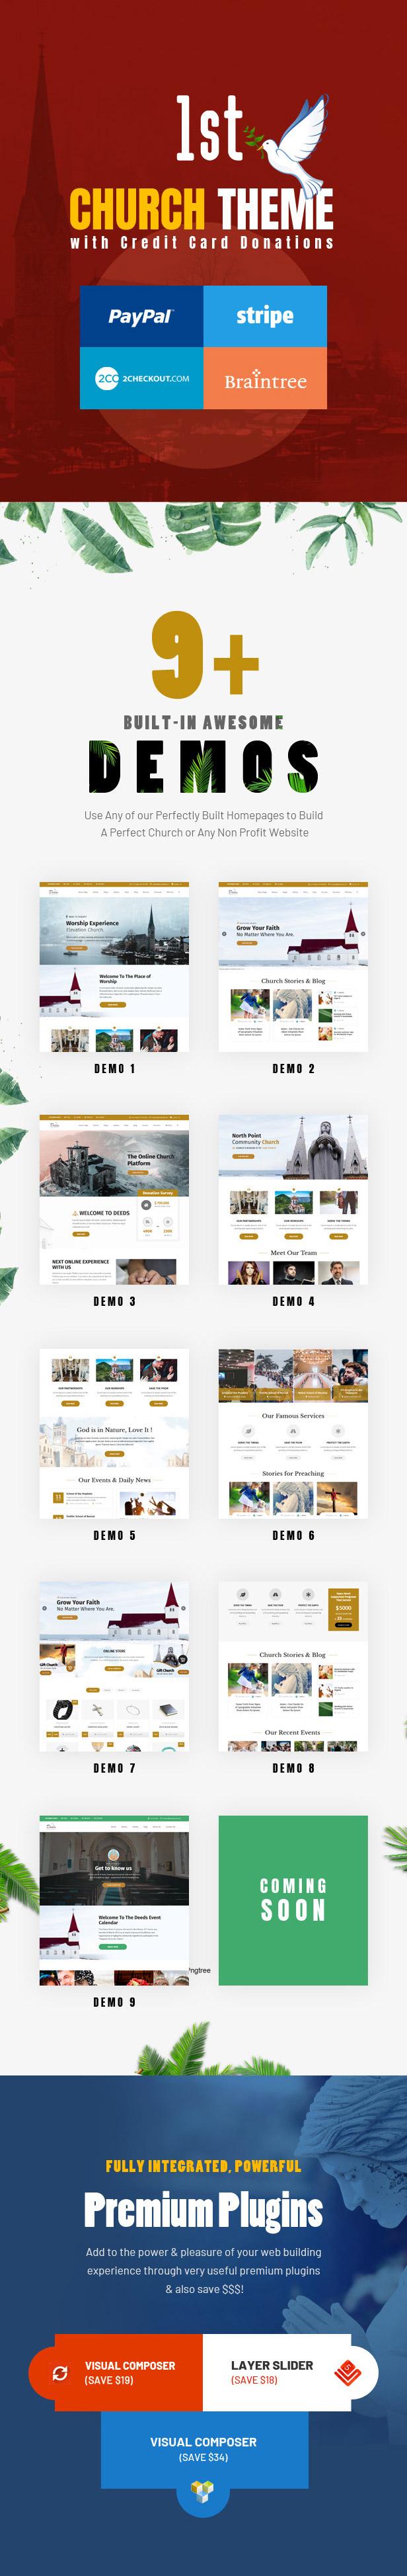 Deeds - El mejor tema responsivo de WordPress para iglesias sin fines de lucro - 3